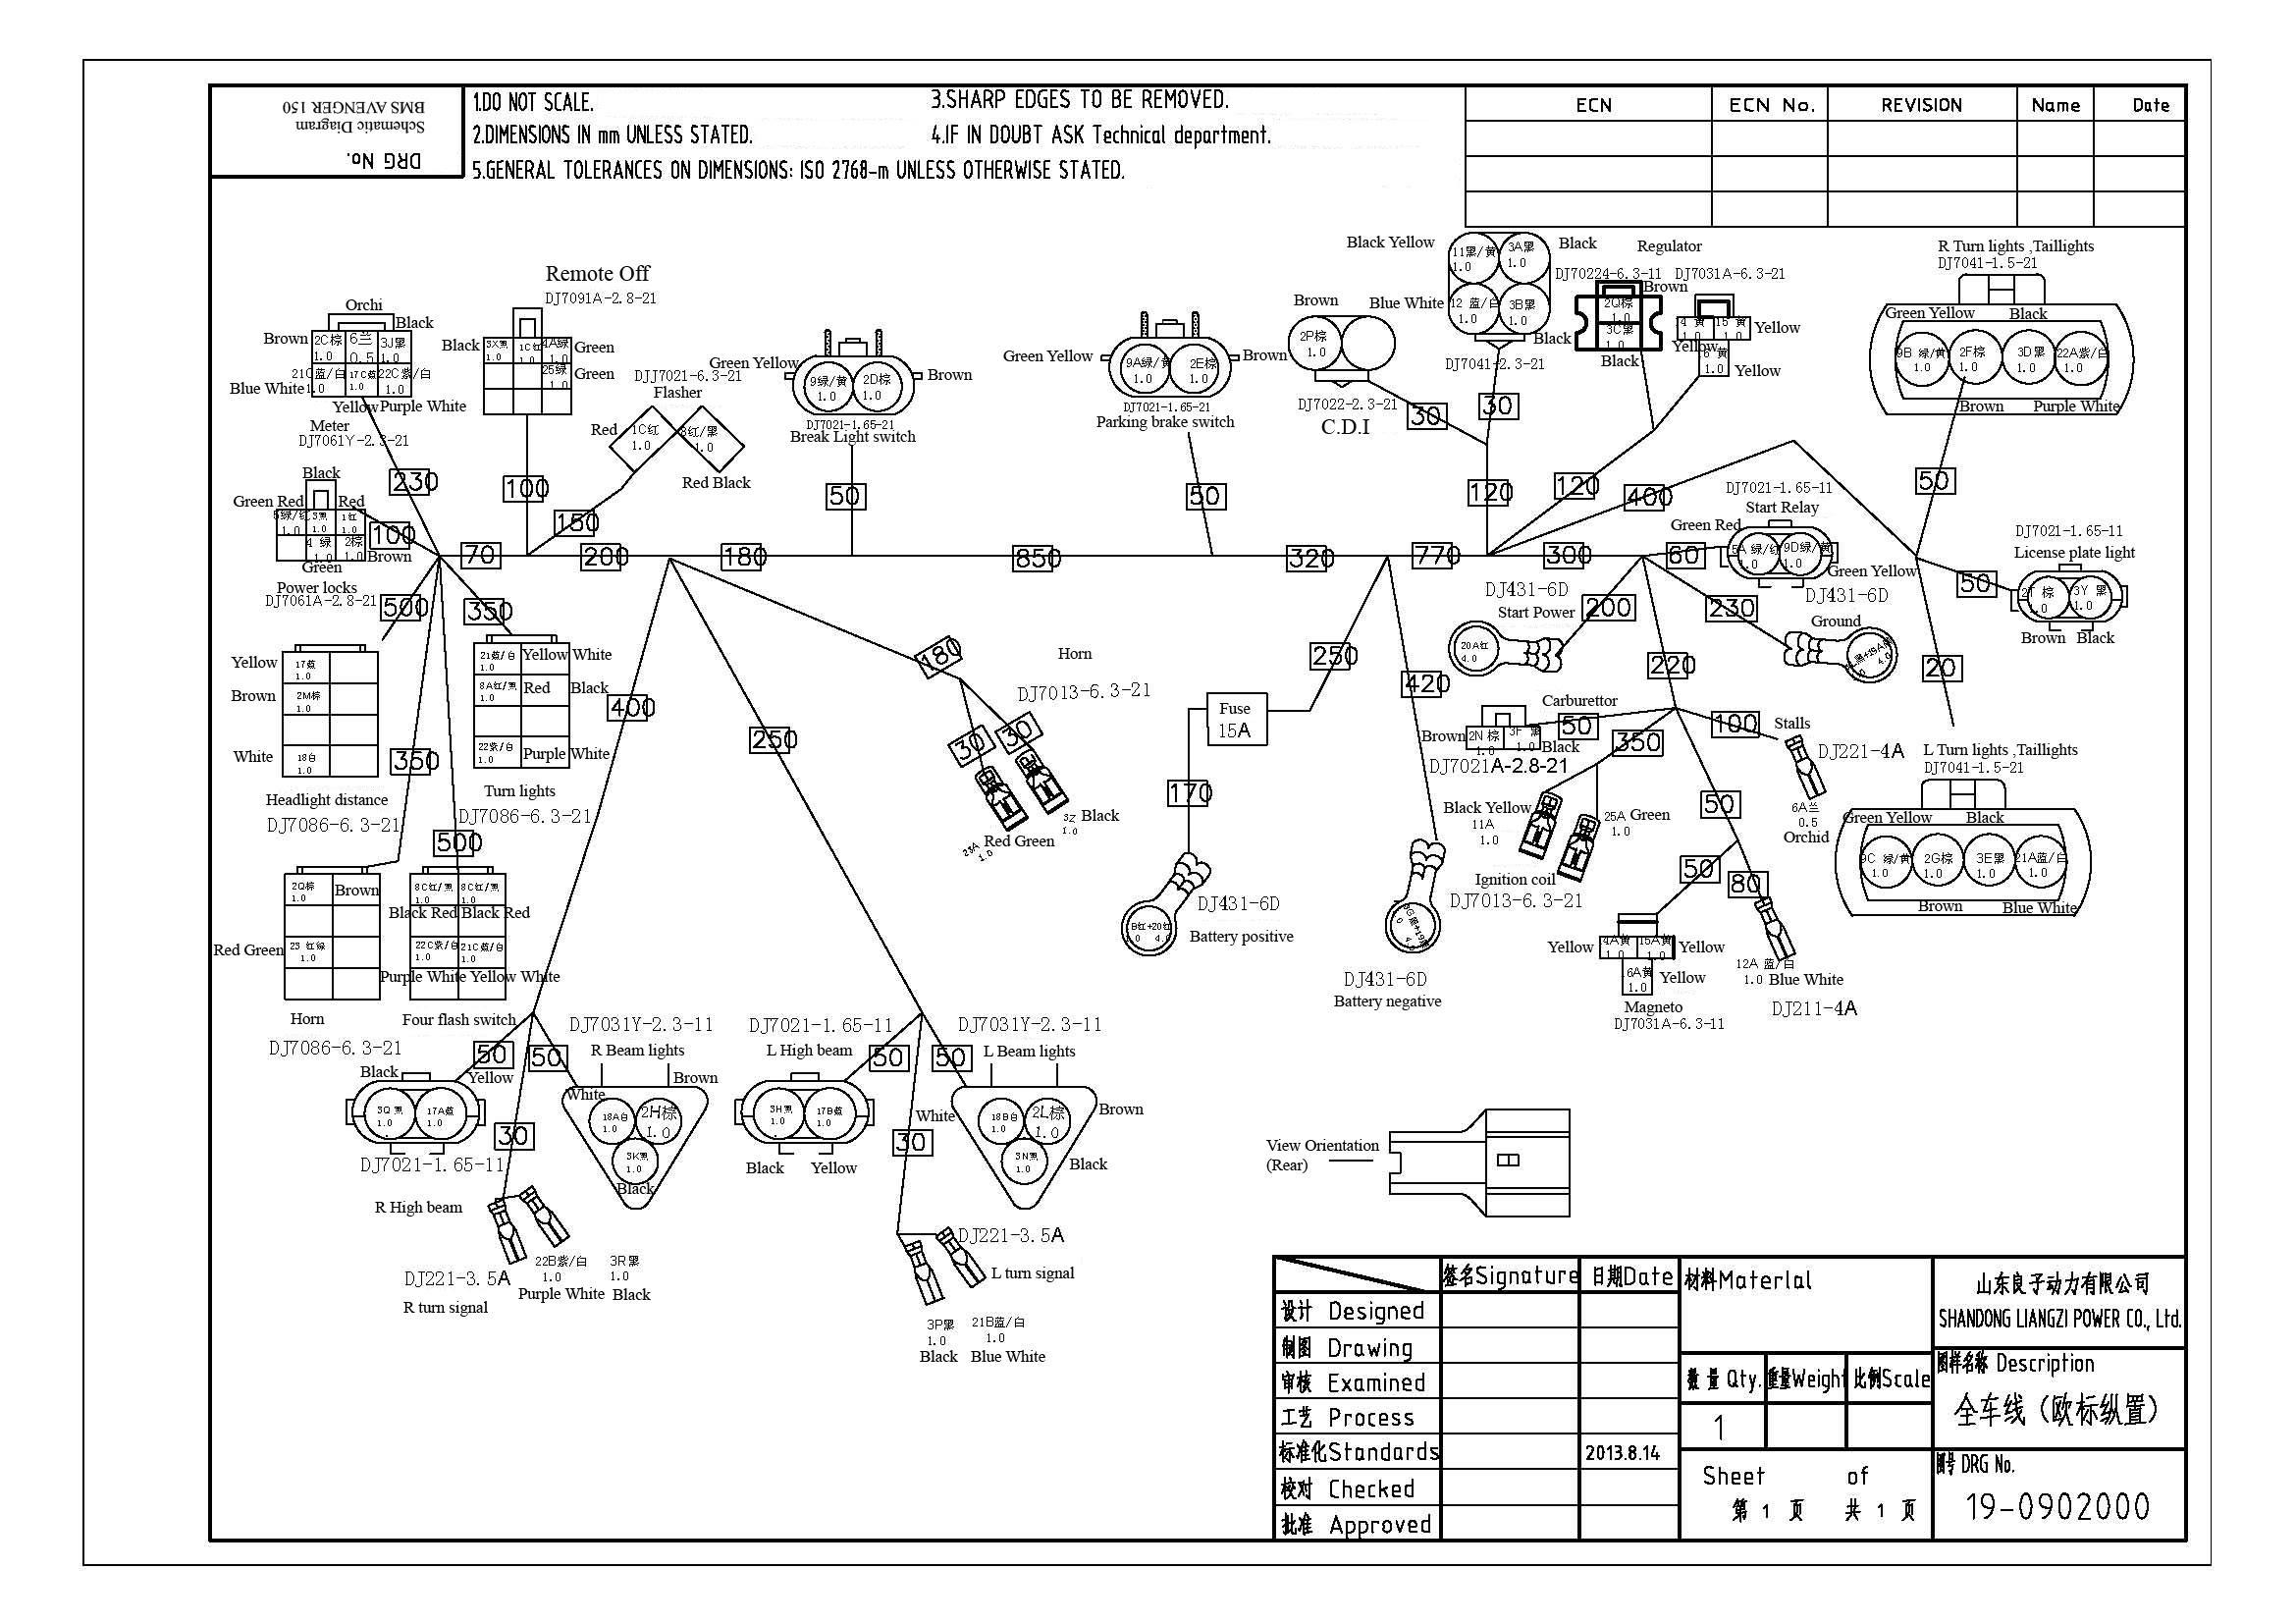 Wiring Diagrams John Deere Gator Hpx Arctic Cat Prowler 4x4 Diagram Fuse Box Toy Elsalvadorla